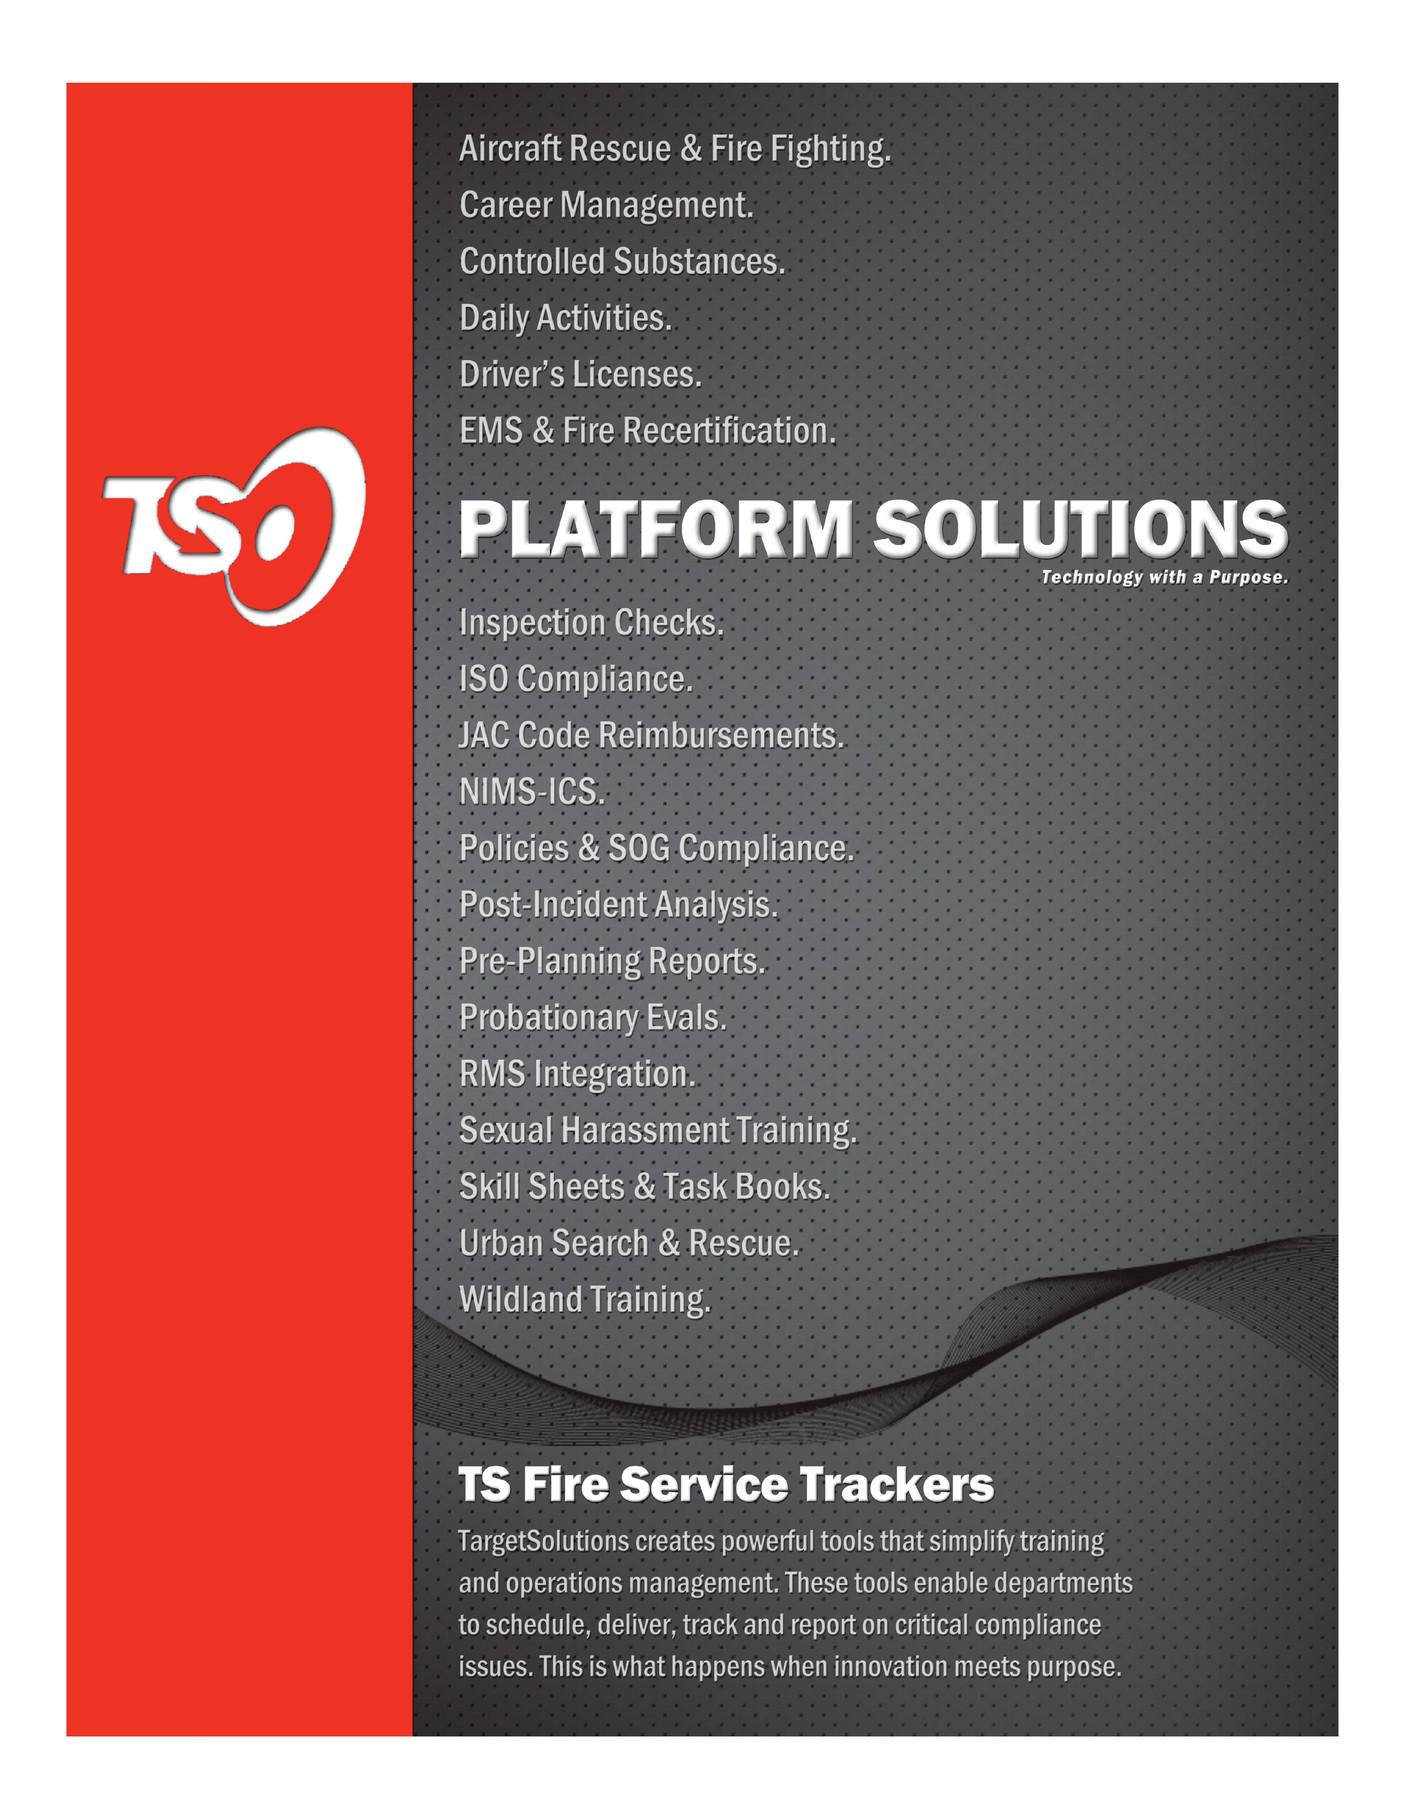 TargetSolutions - Platform Solutions: TS Fire Service